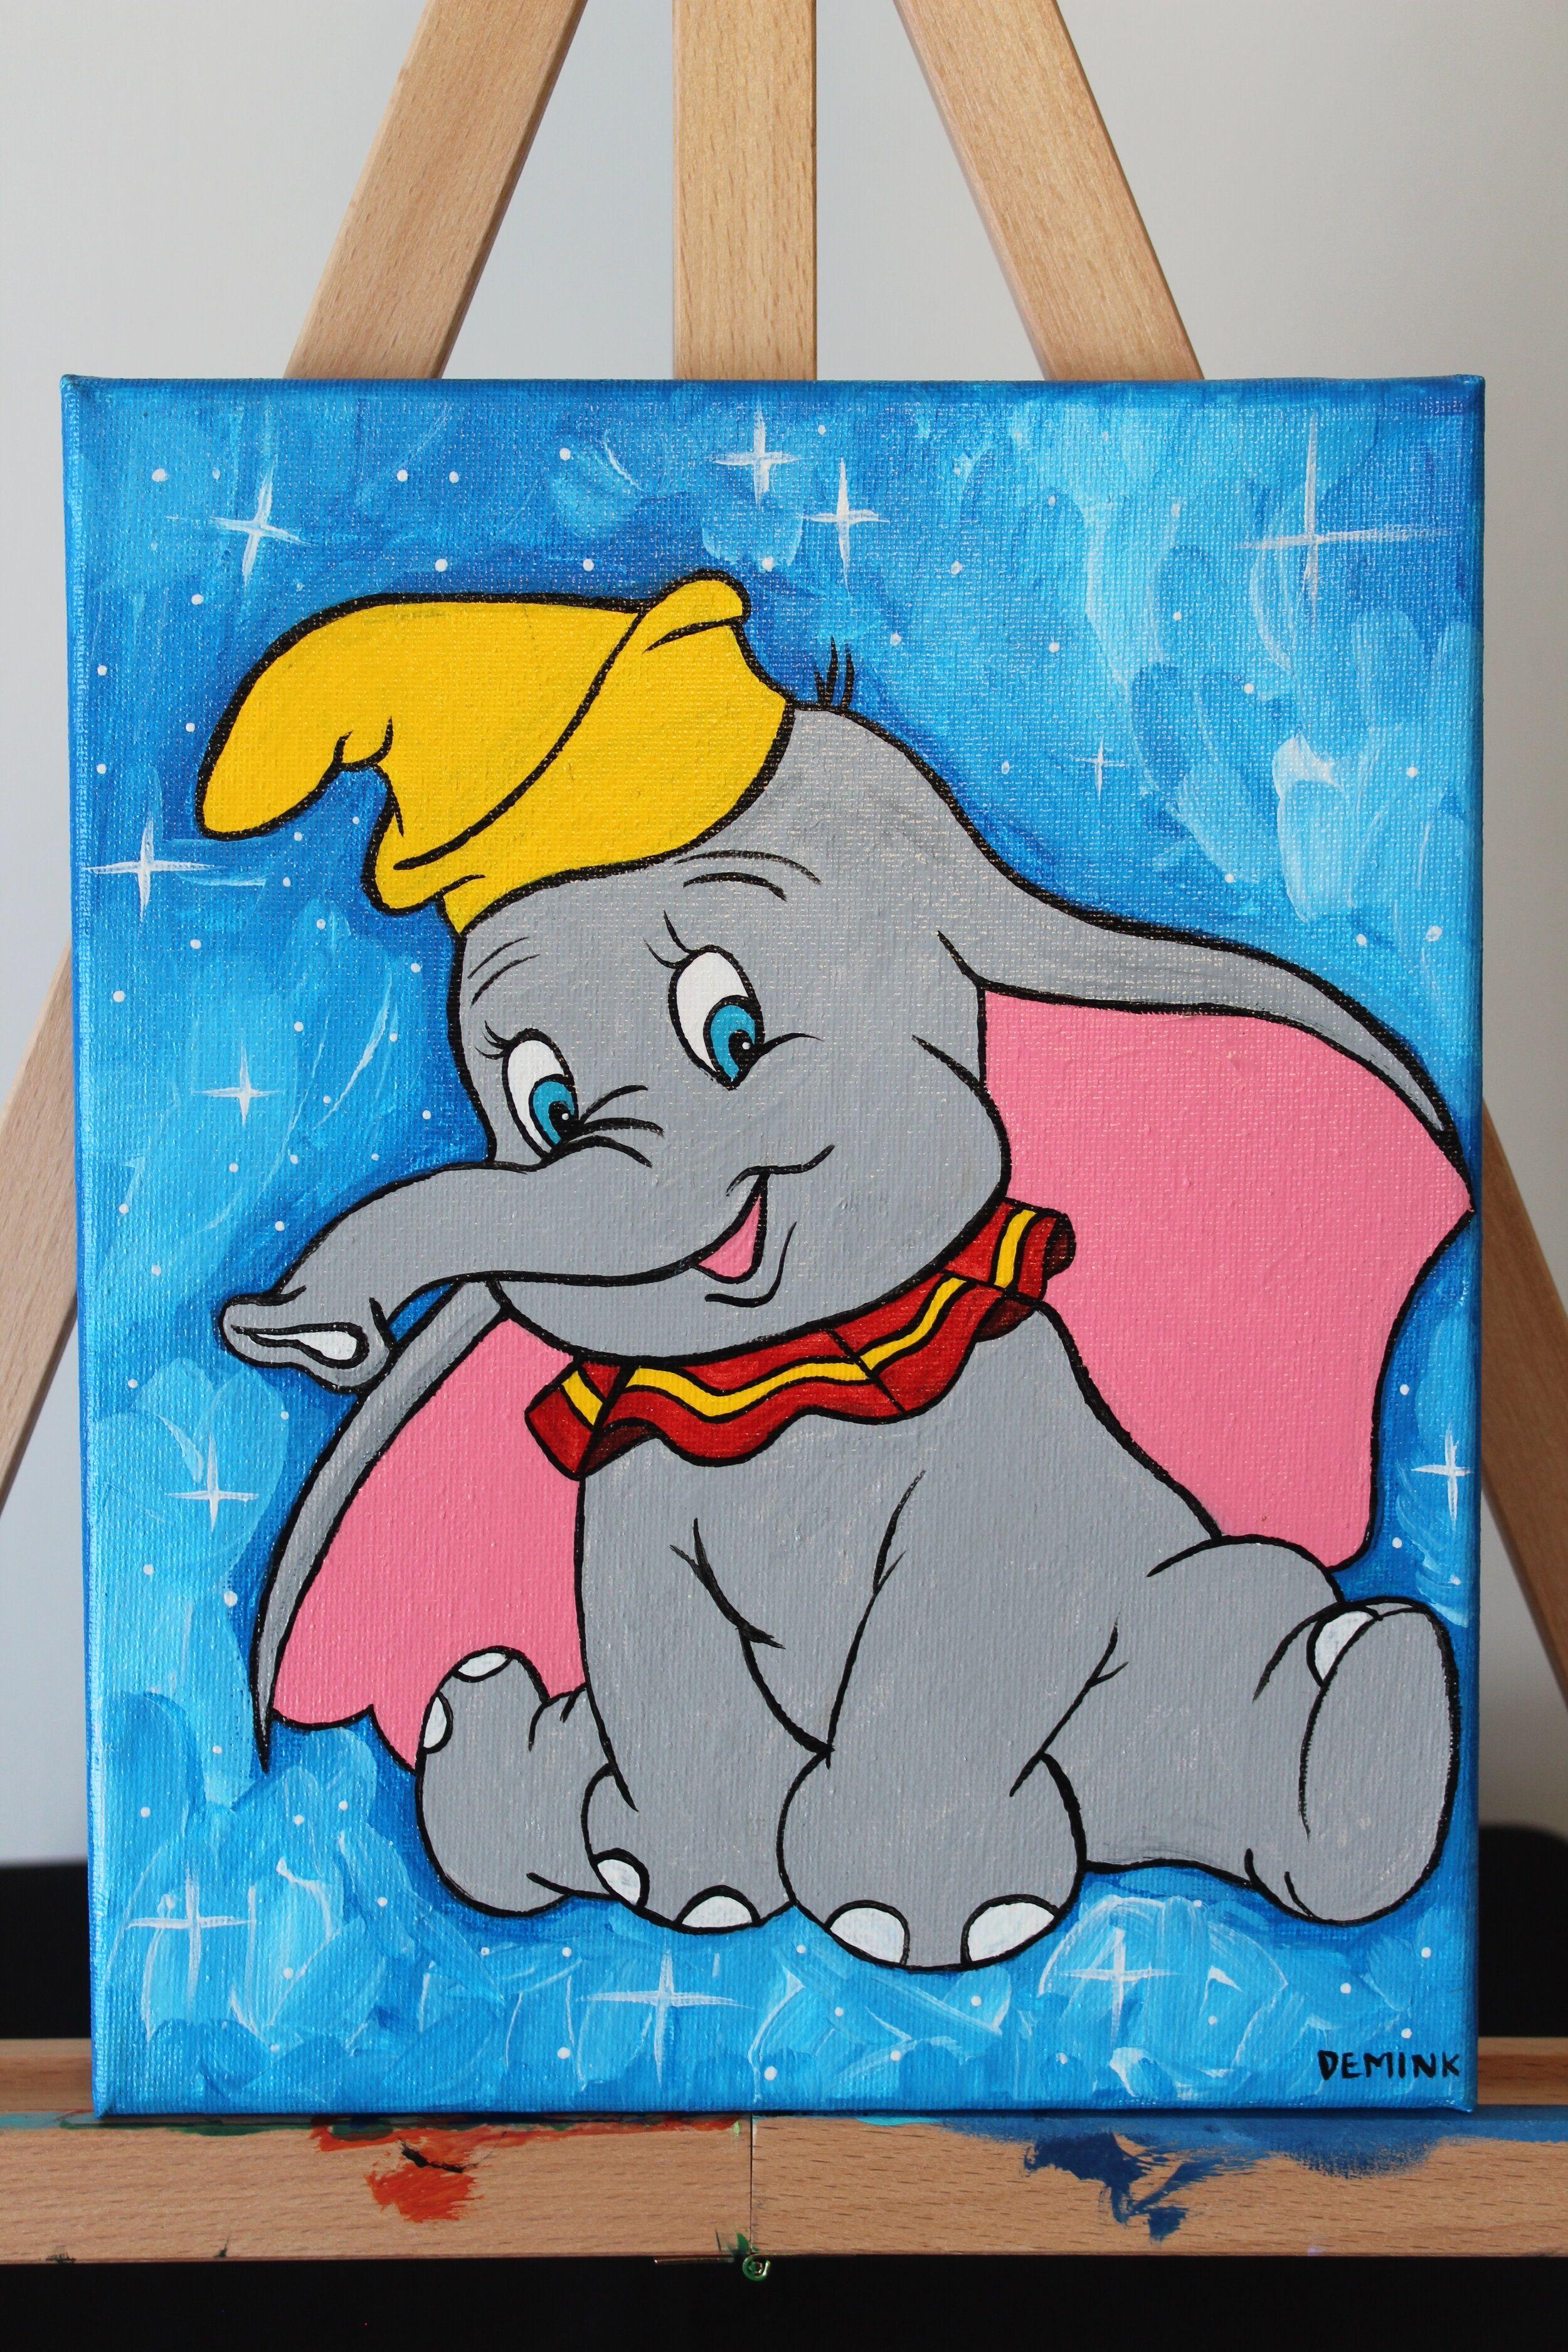 Sleeping Dumbo Inspired Canvas Painting